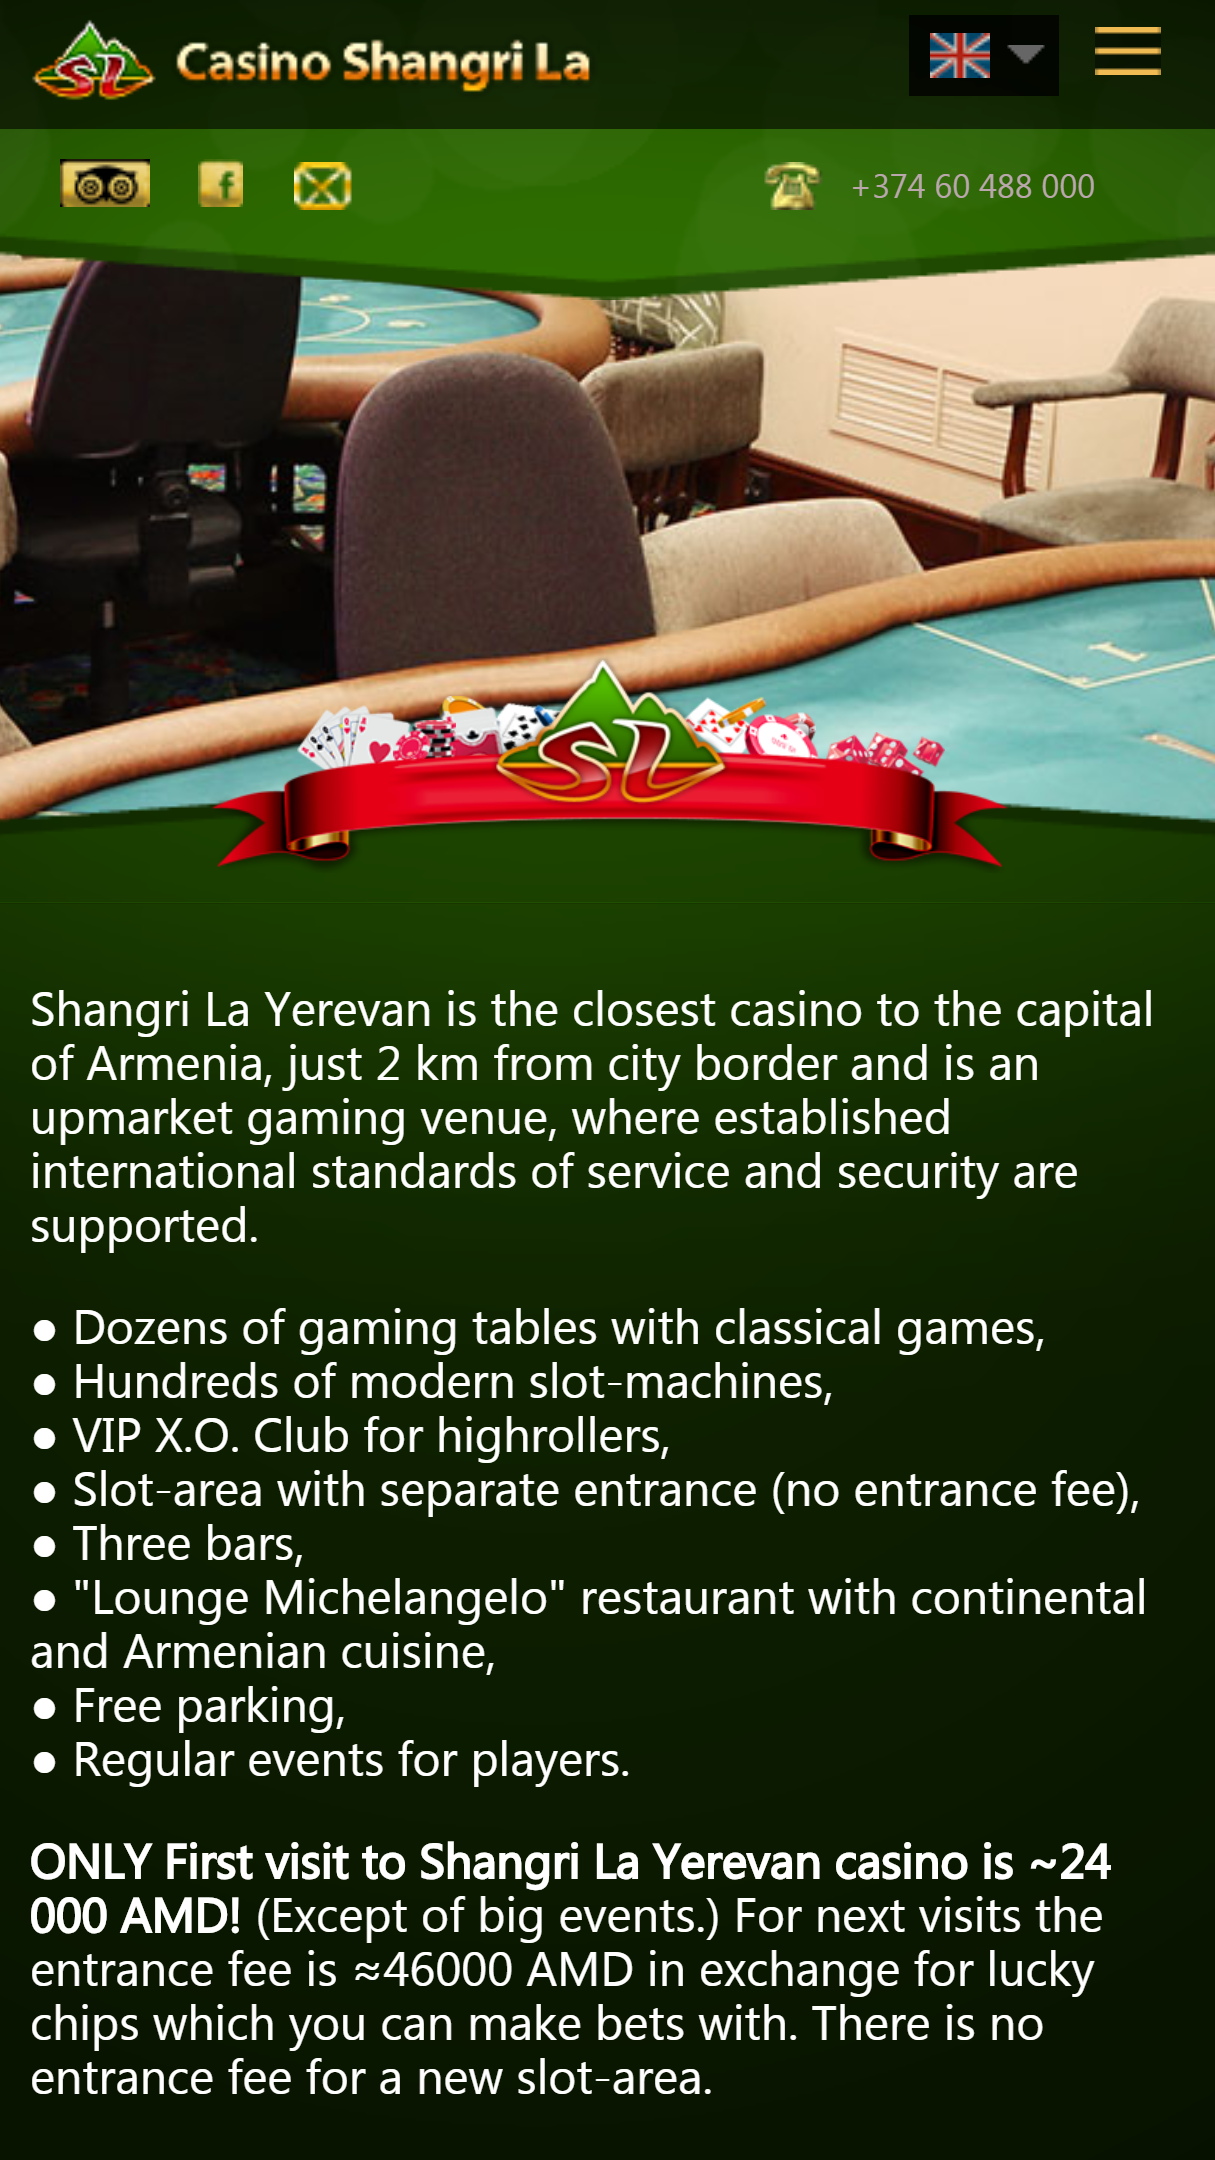 Shangri La Casino App Homepage